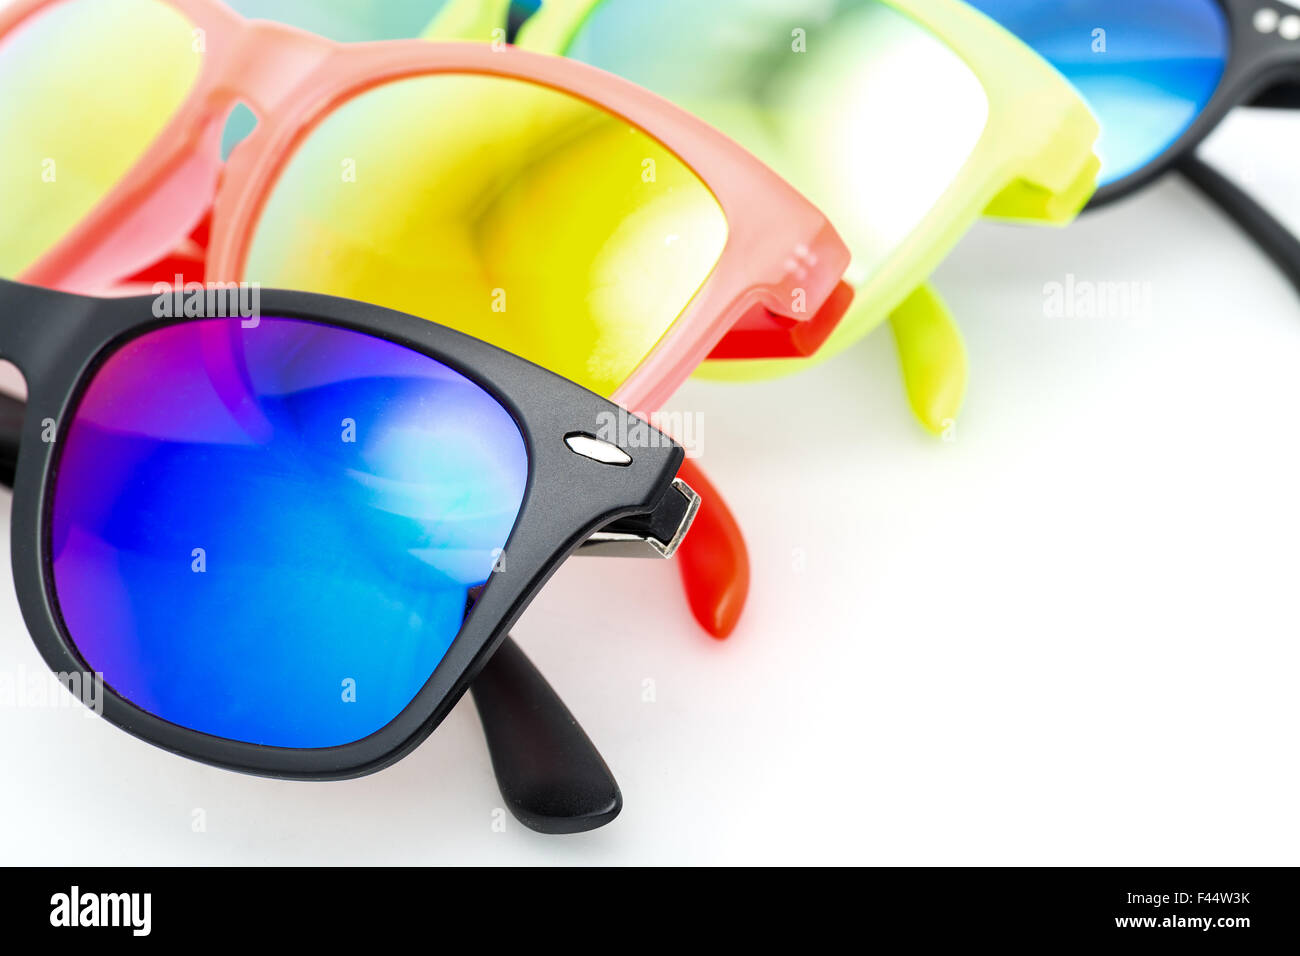 Few Very Bright Sunglasses Eyewear - Stock Image